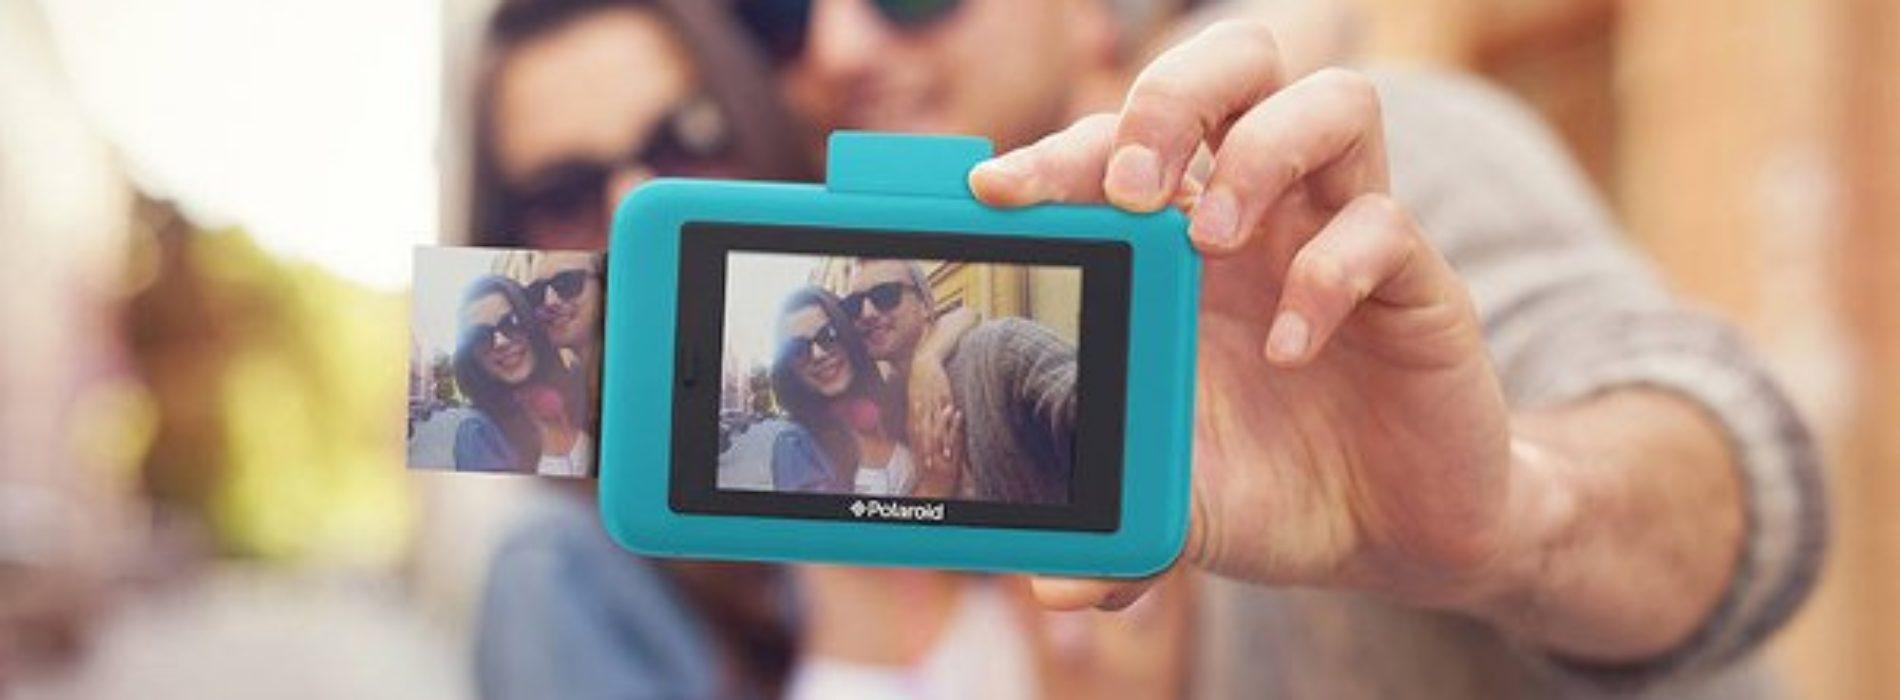 Polaroid Snap Touch cuenta impresión inmediata